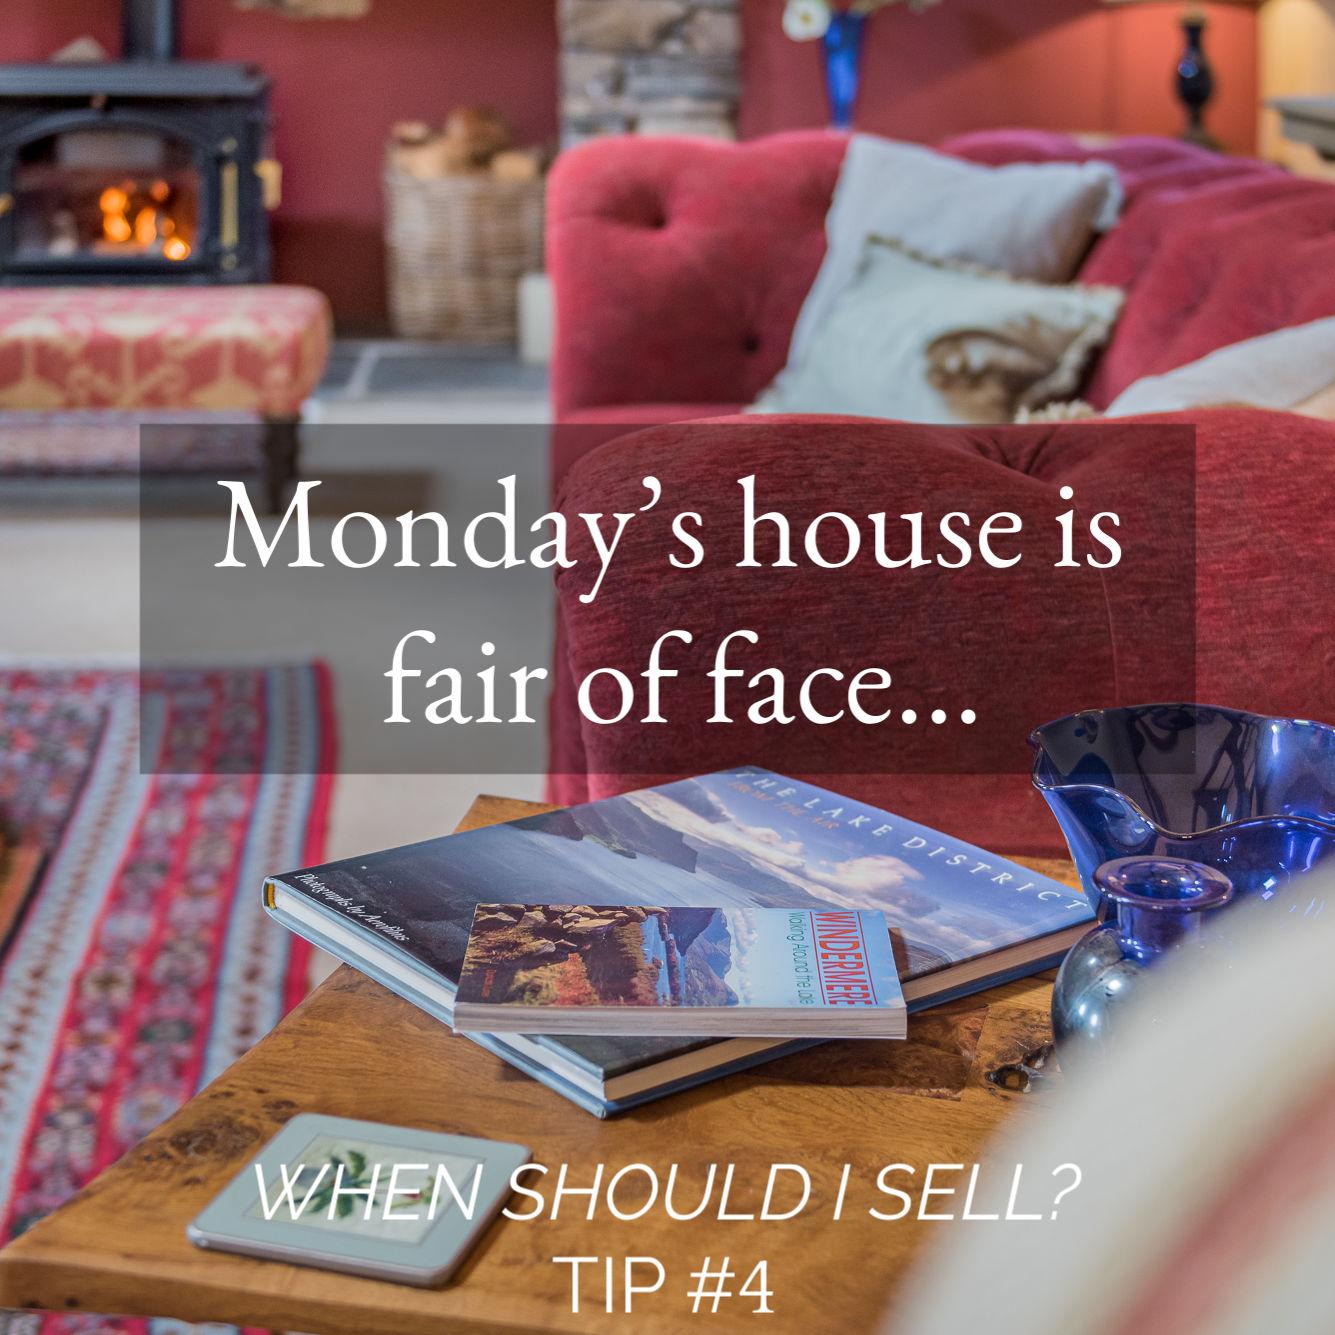 tg4-mondays-house-is-fair-of-face